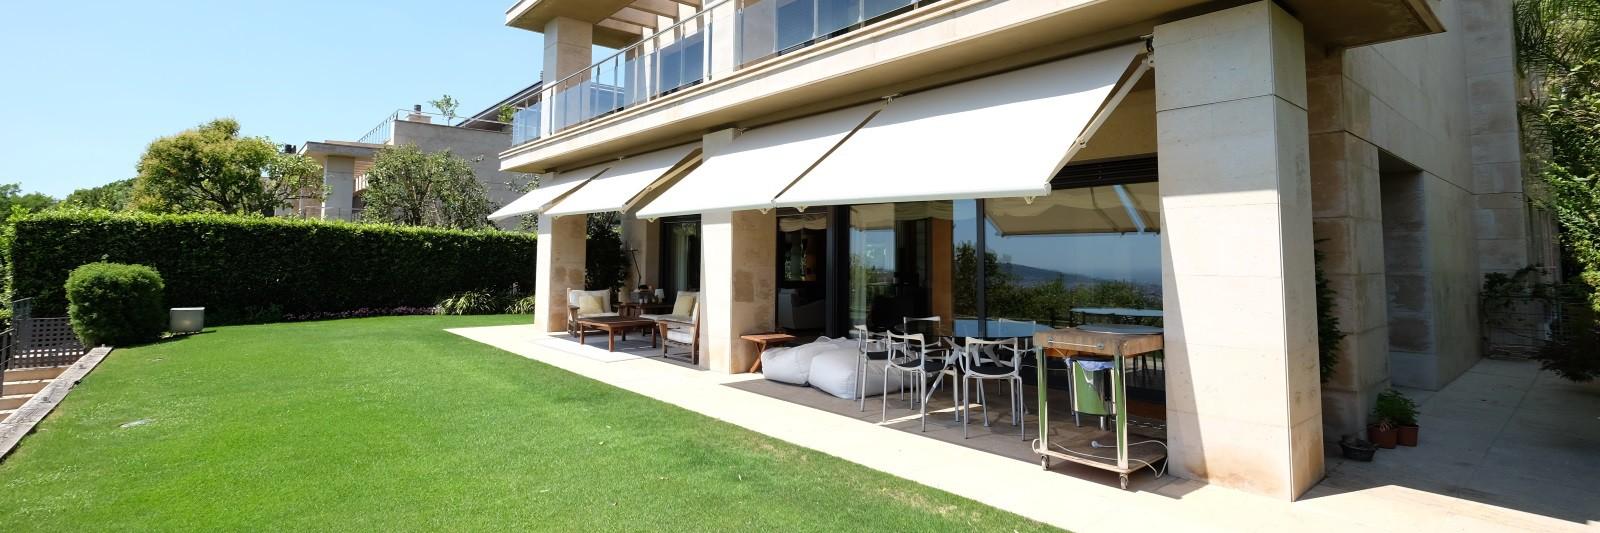 MG Inmobiliaria Barcelona - 5fa2f150f15419728c30e8e36eda85891469465144.jpg